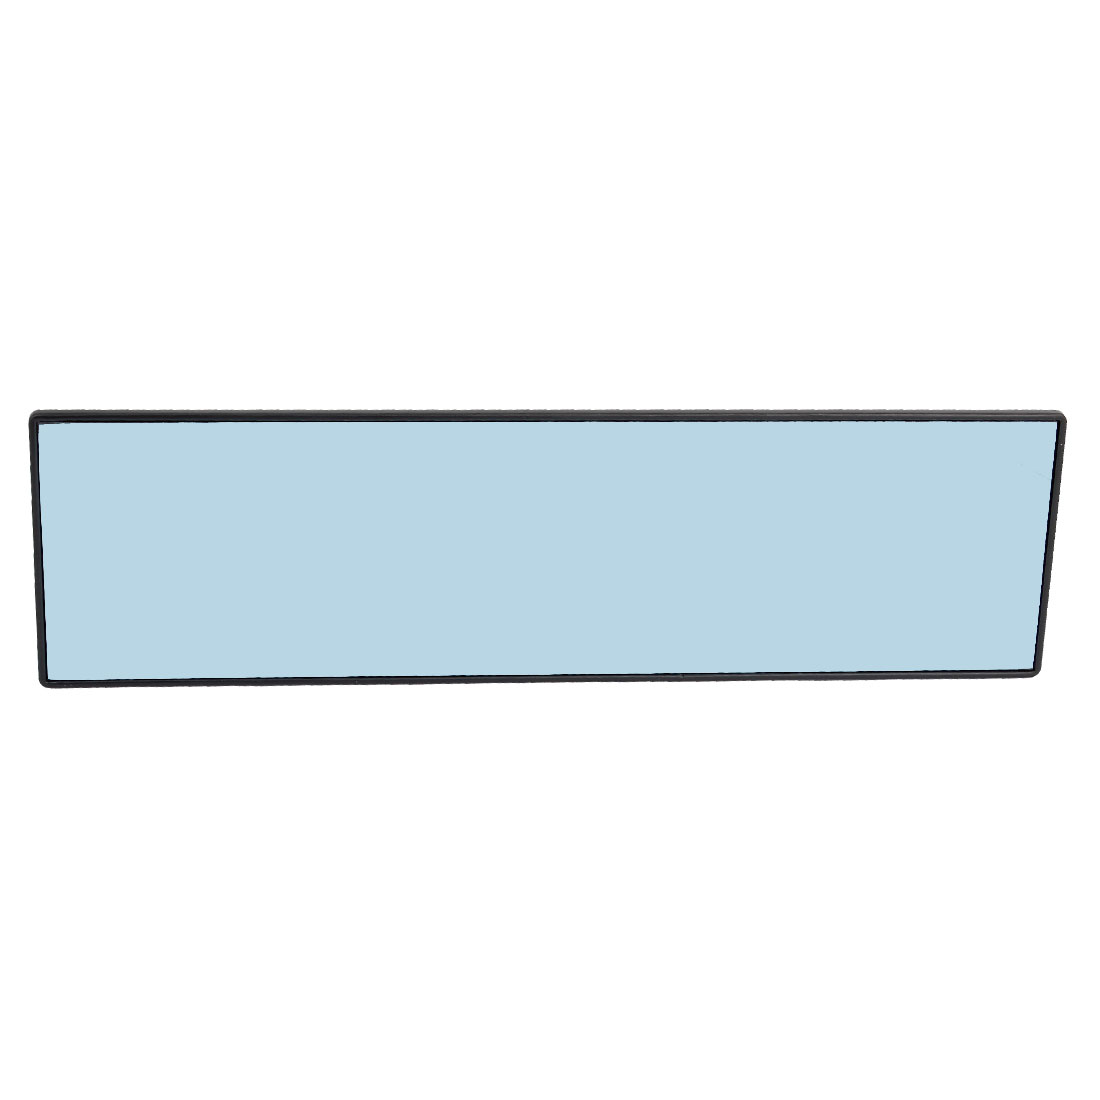 330mm x 90mm Black Plastic Frame Car Interior Flat Blue Glass Rearview Mirror